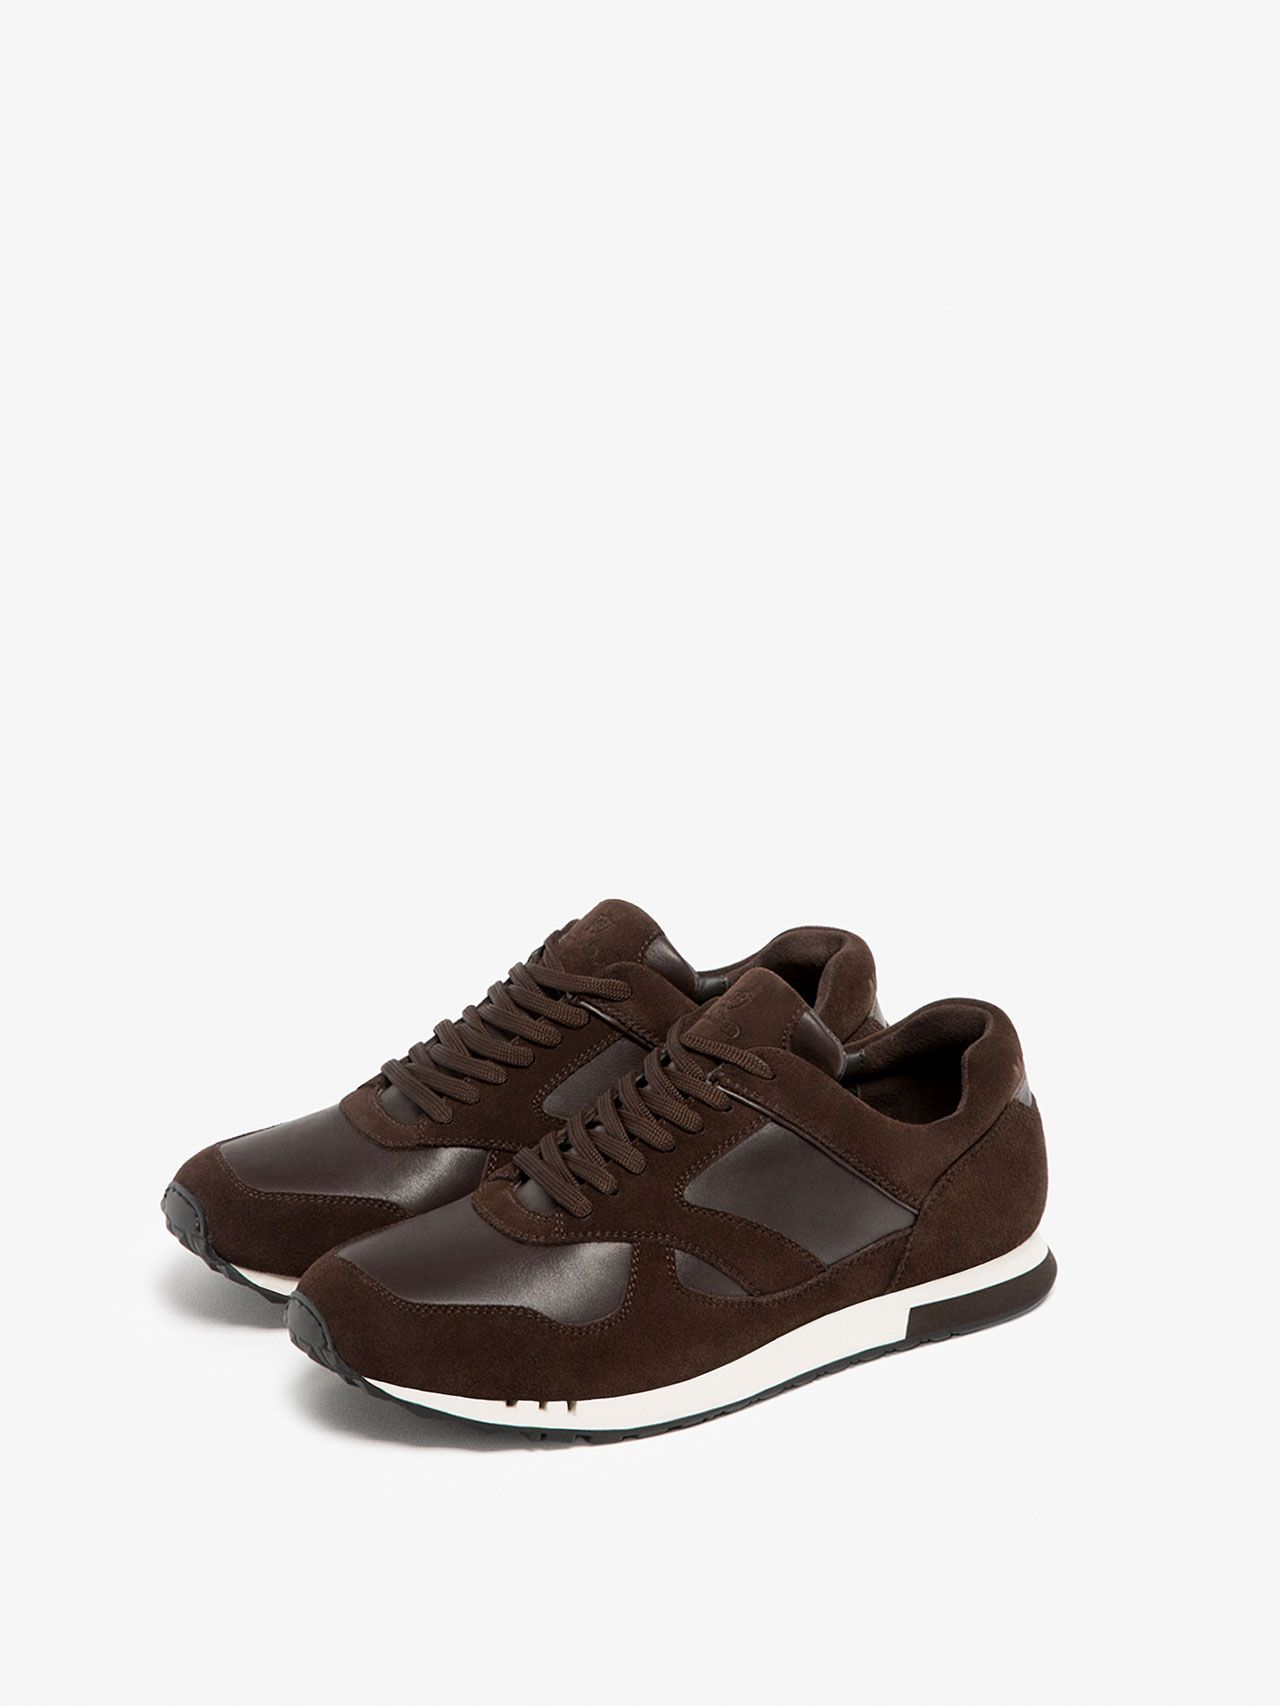 View all - Shoes - MEN - Massimo Dutti - United Kingdom